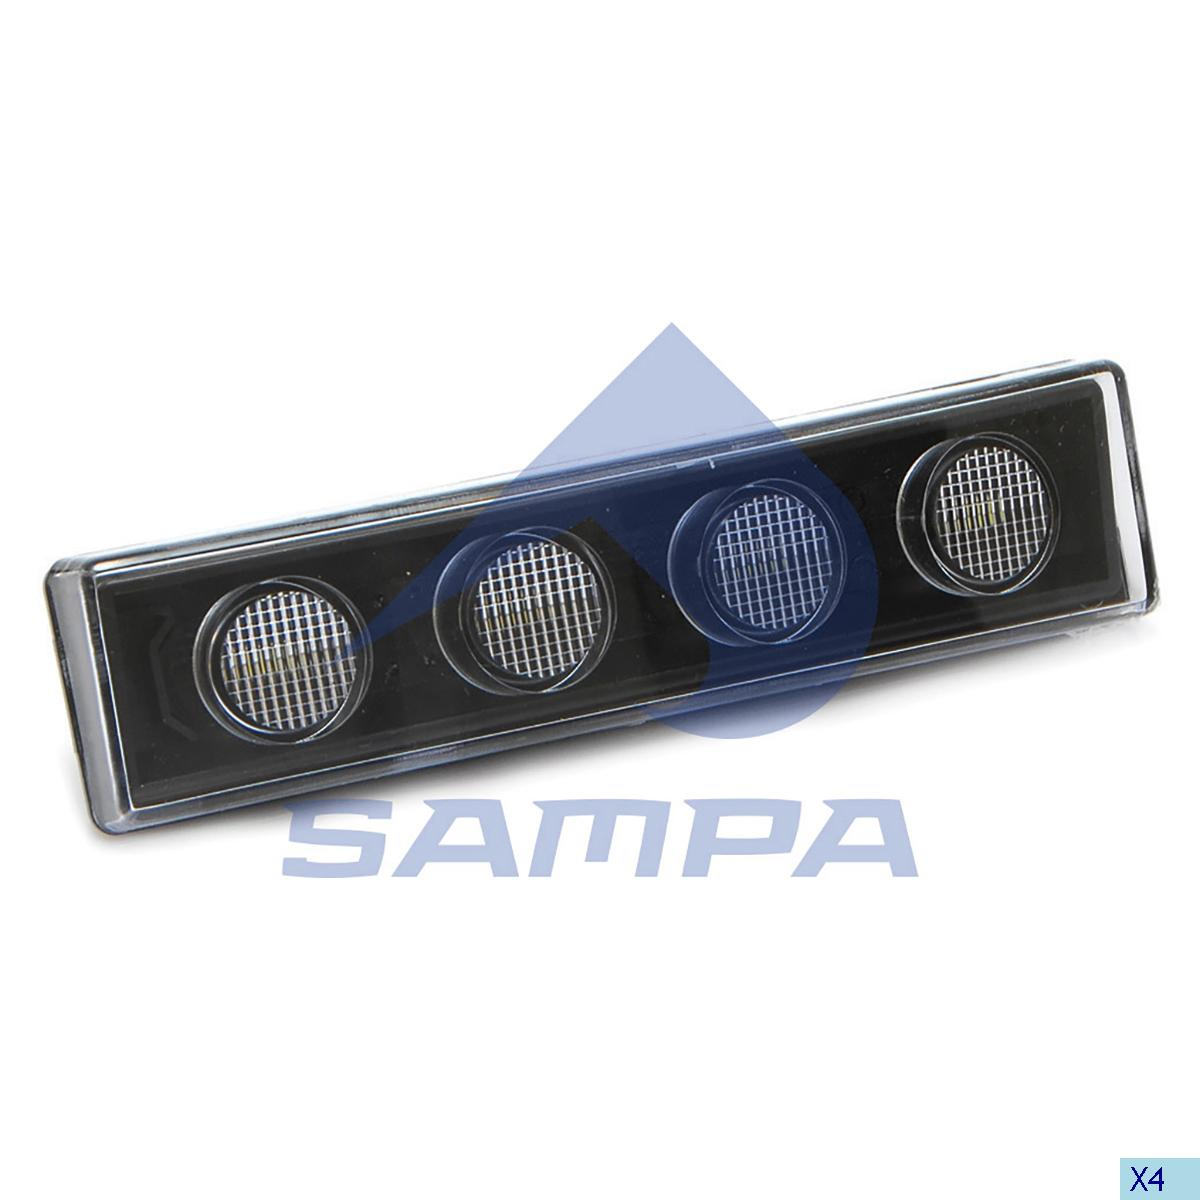 Spot Lamp, Sun Visor, Scania, Cab